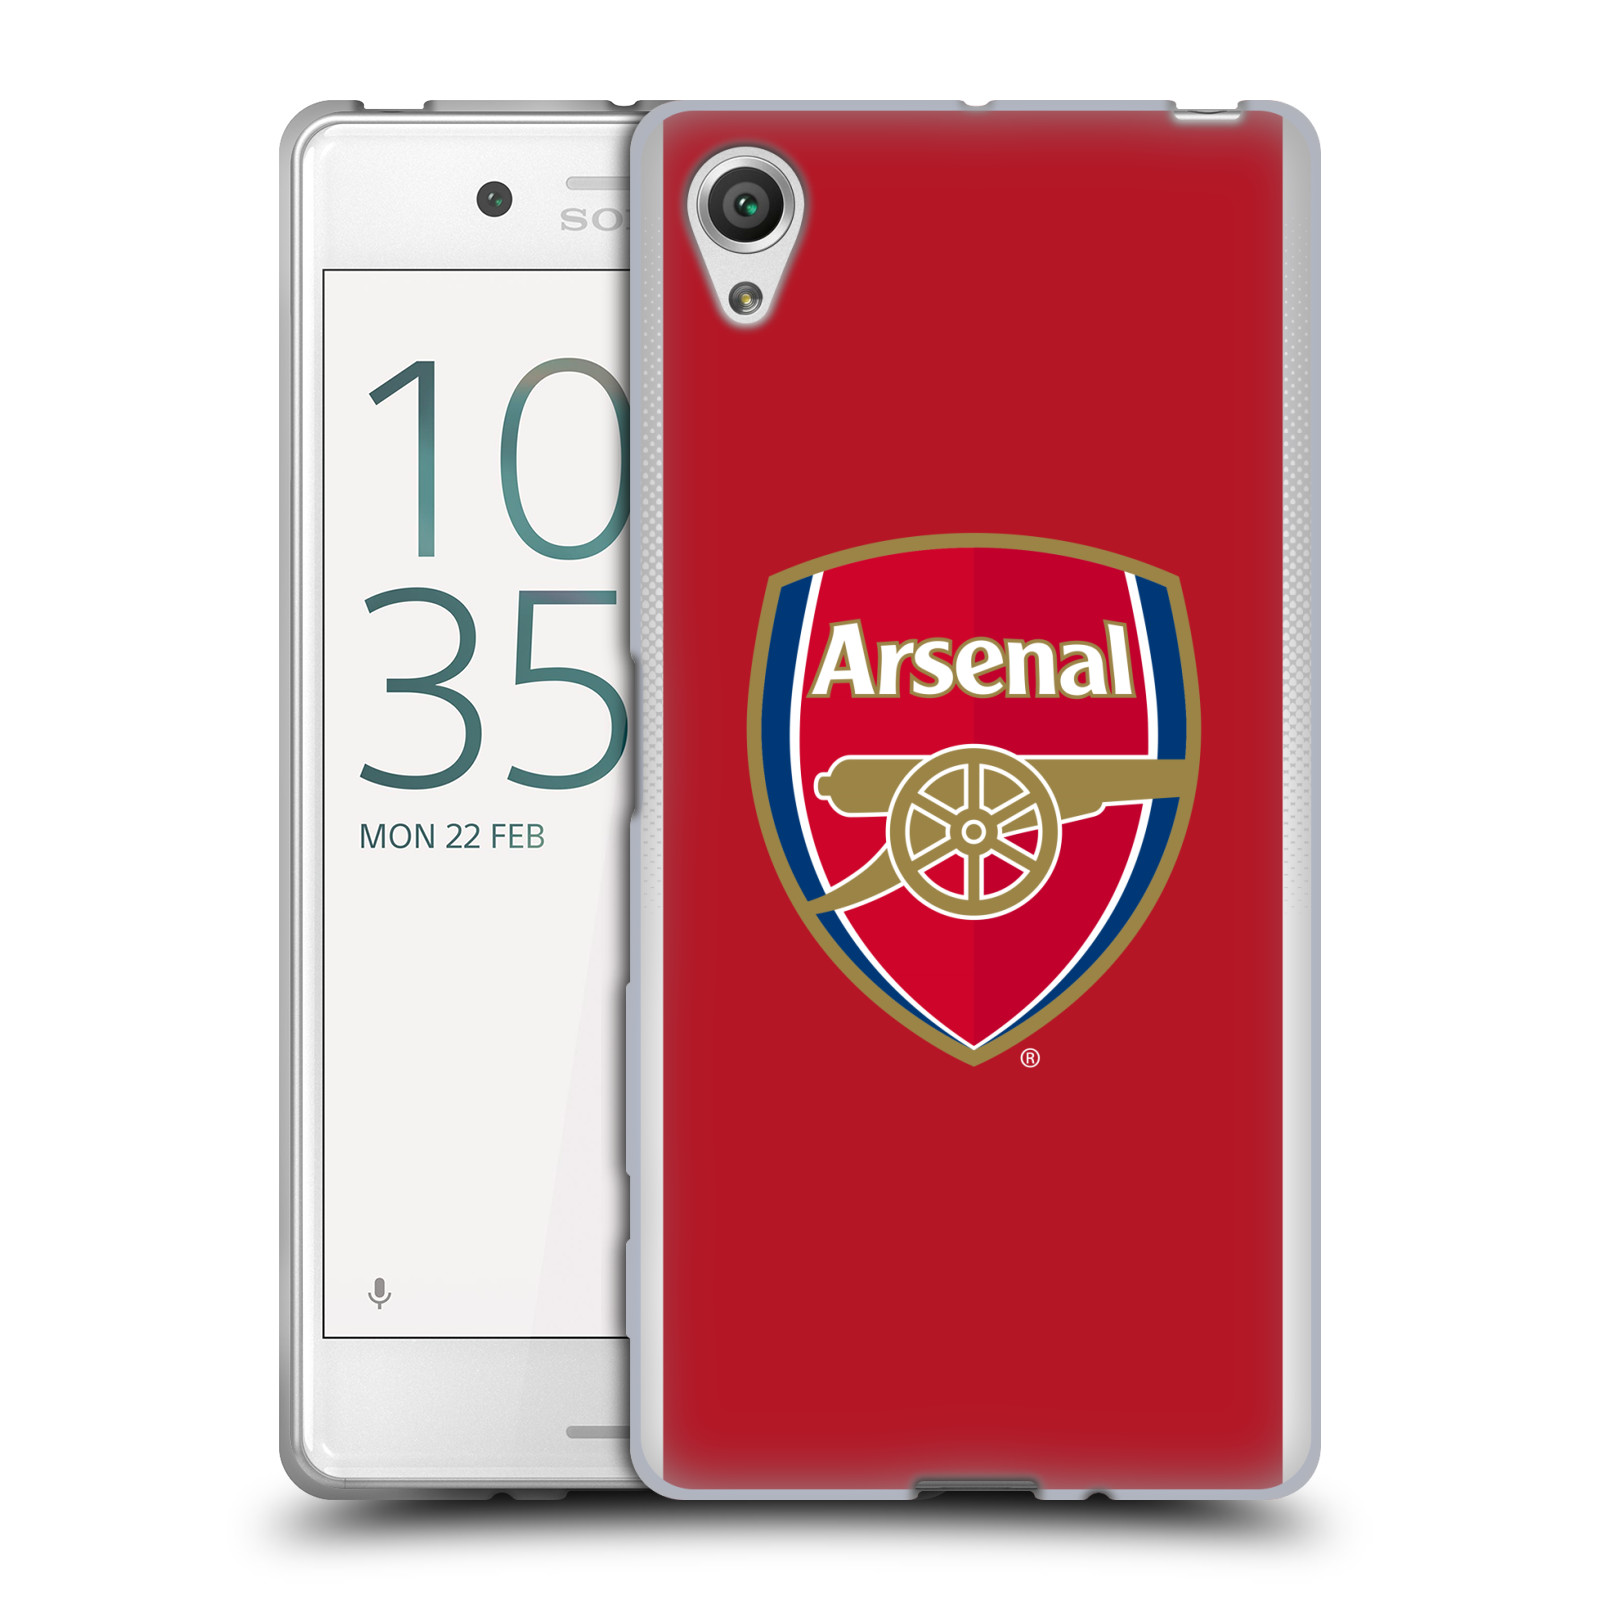 Silikonové pouzdro na mobil Sony Xperia X - Head Case - Arsenal FC - Logo klubu